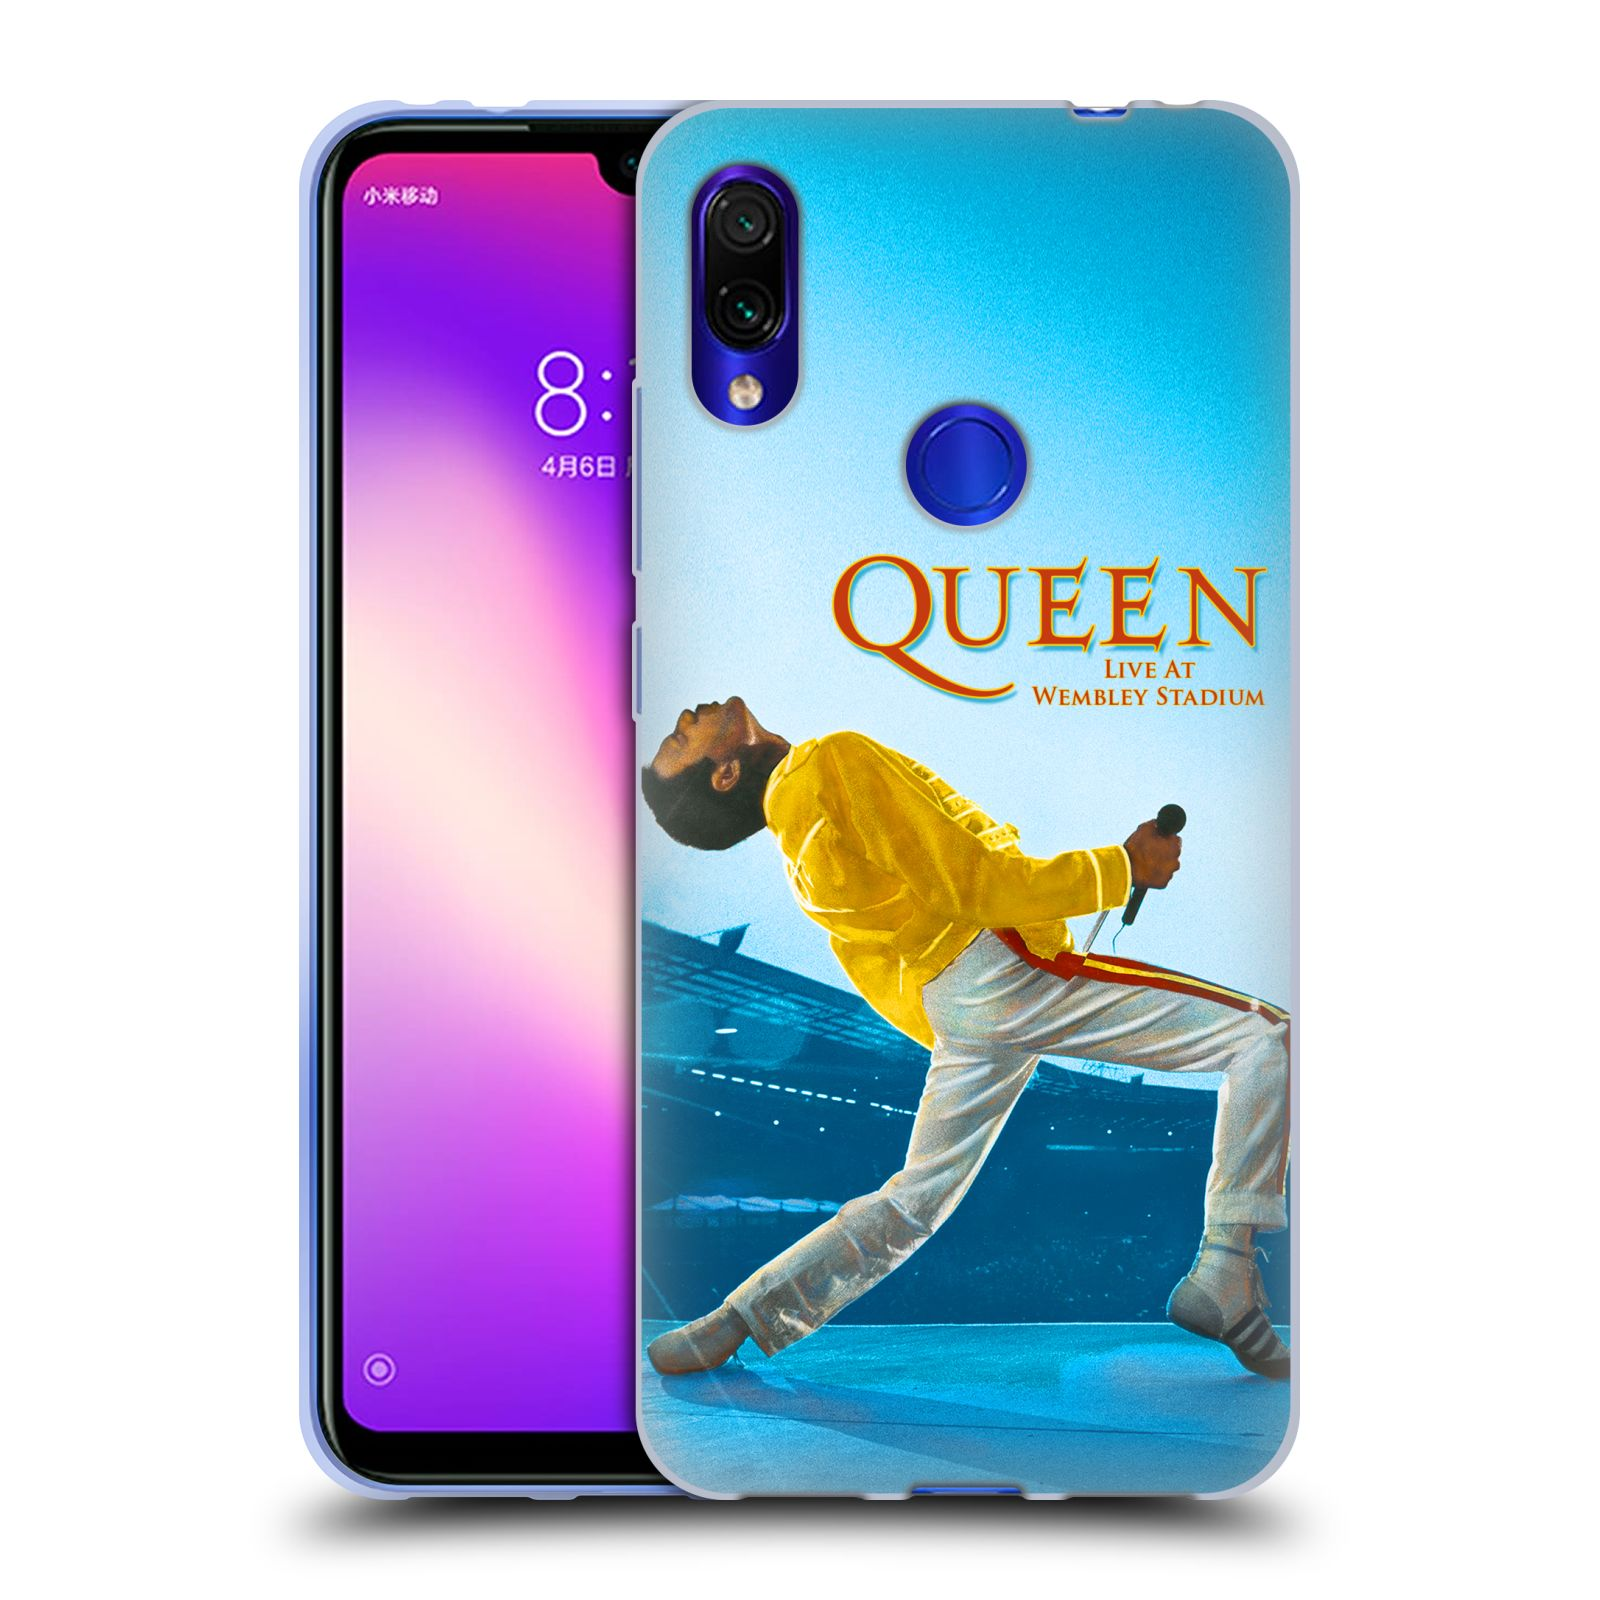 Silikonové pouzdro na mobil Xiaomi Redmi Note 7 - Head Case - Queen - Freddie Mercury